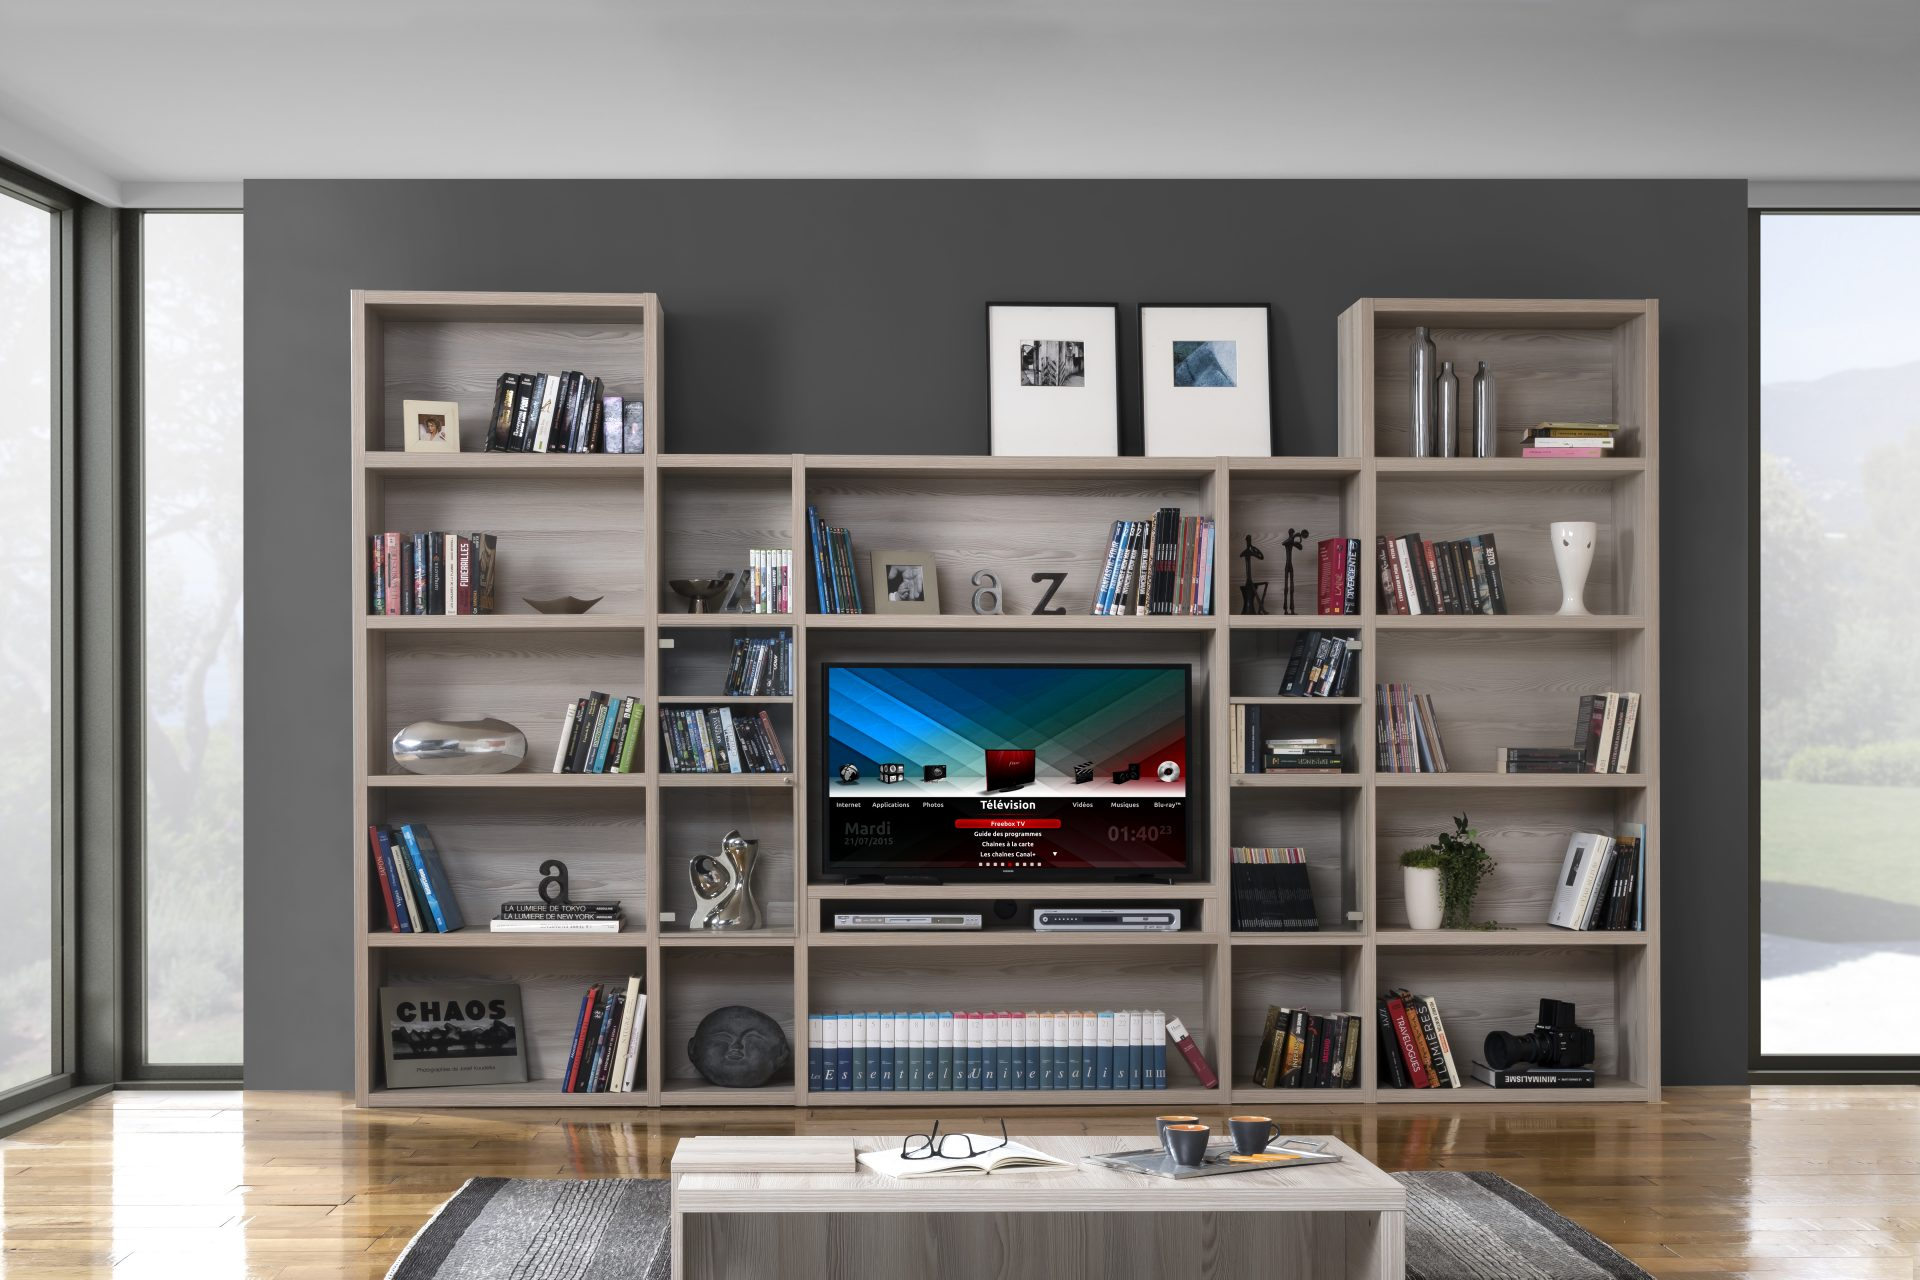 Meubles manhattan configurateur d meubles minet